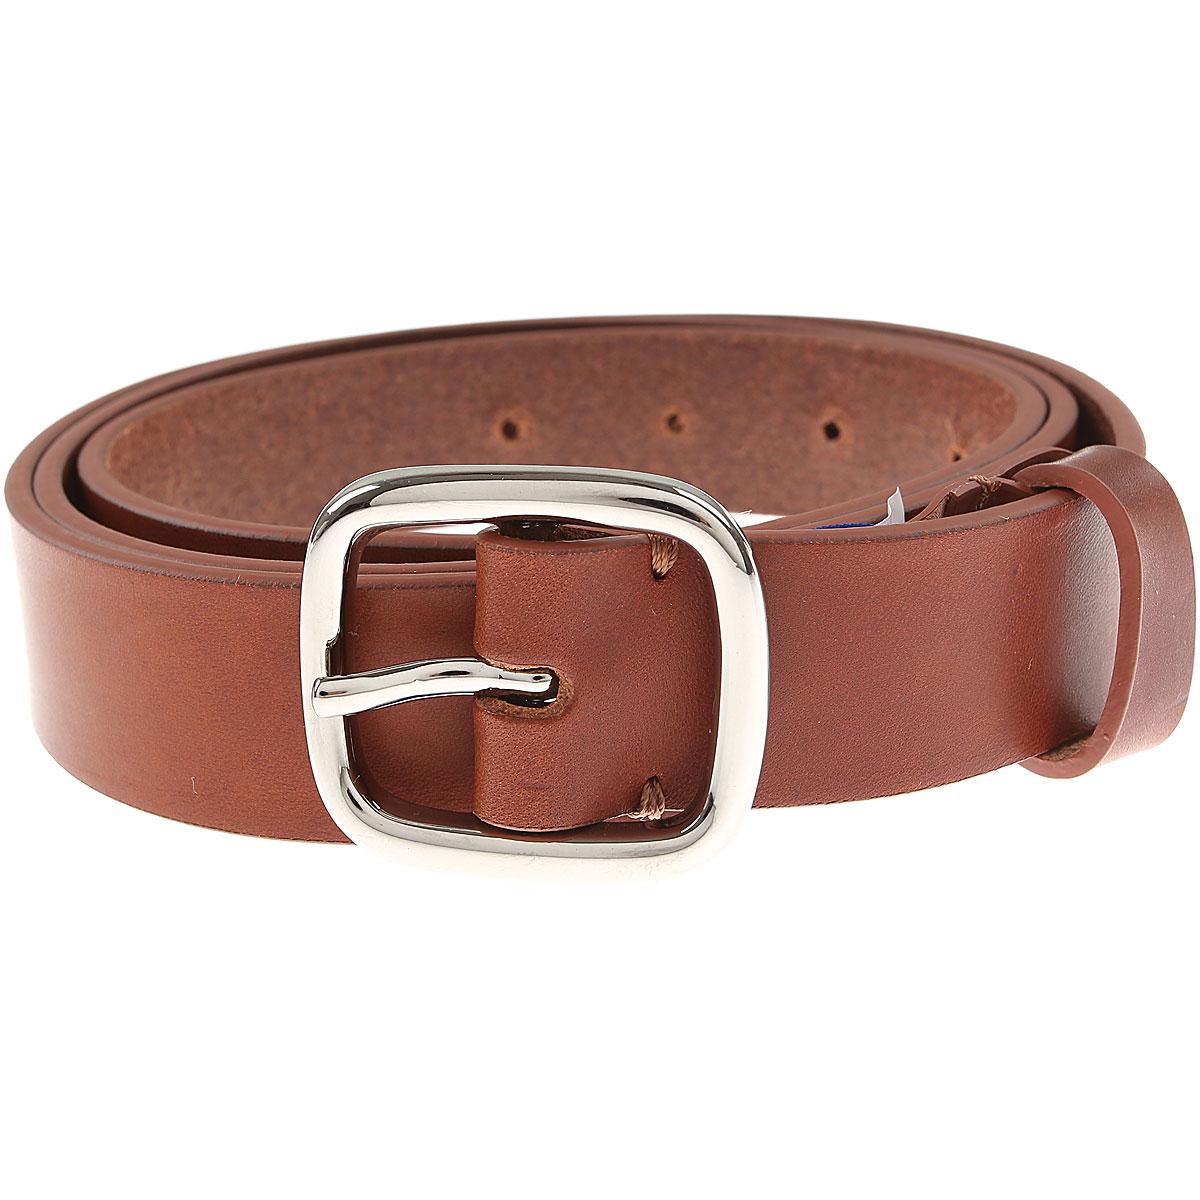 Comme des Garcons Mens Belts On Sale, Brown, Leather, 2019